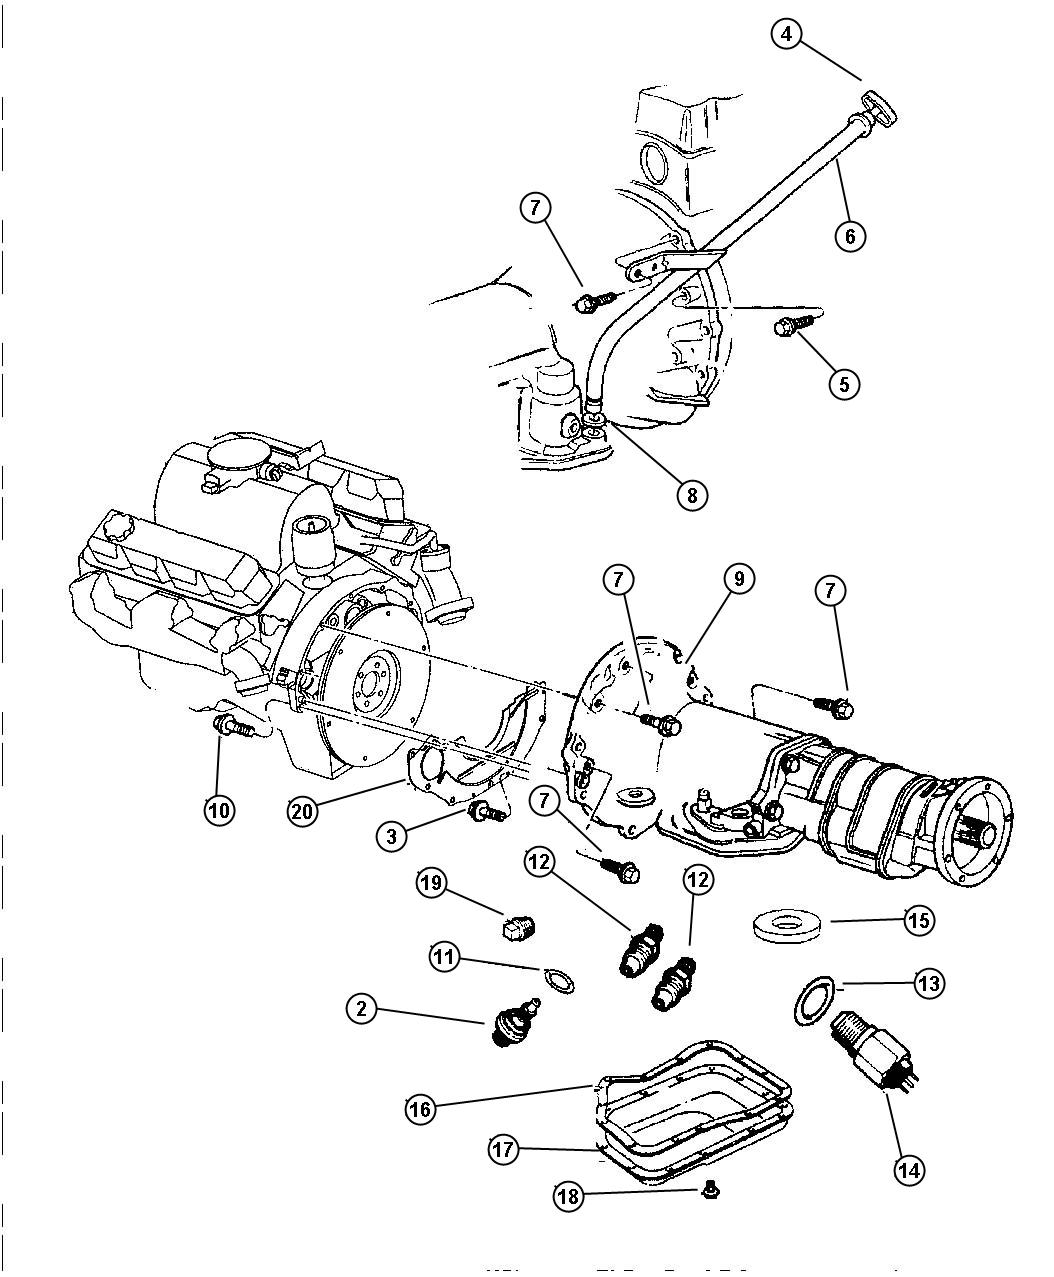 dodge 46re wiring diagram